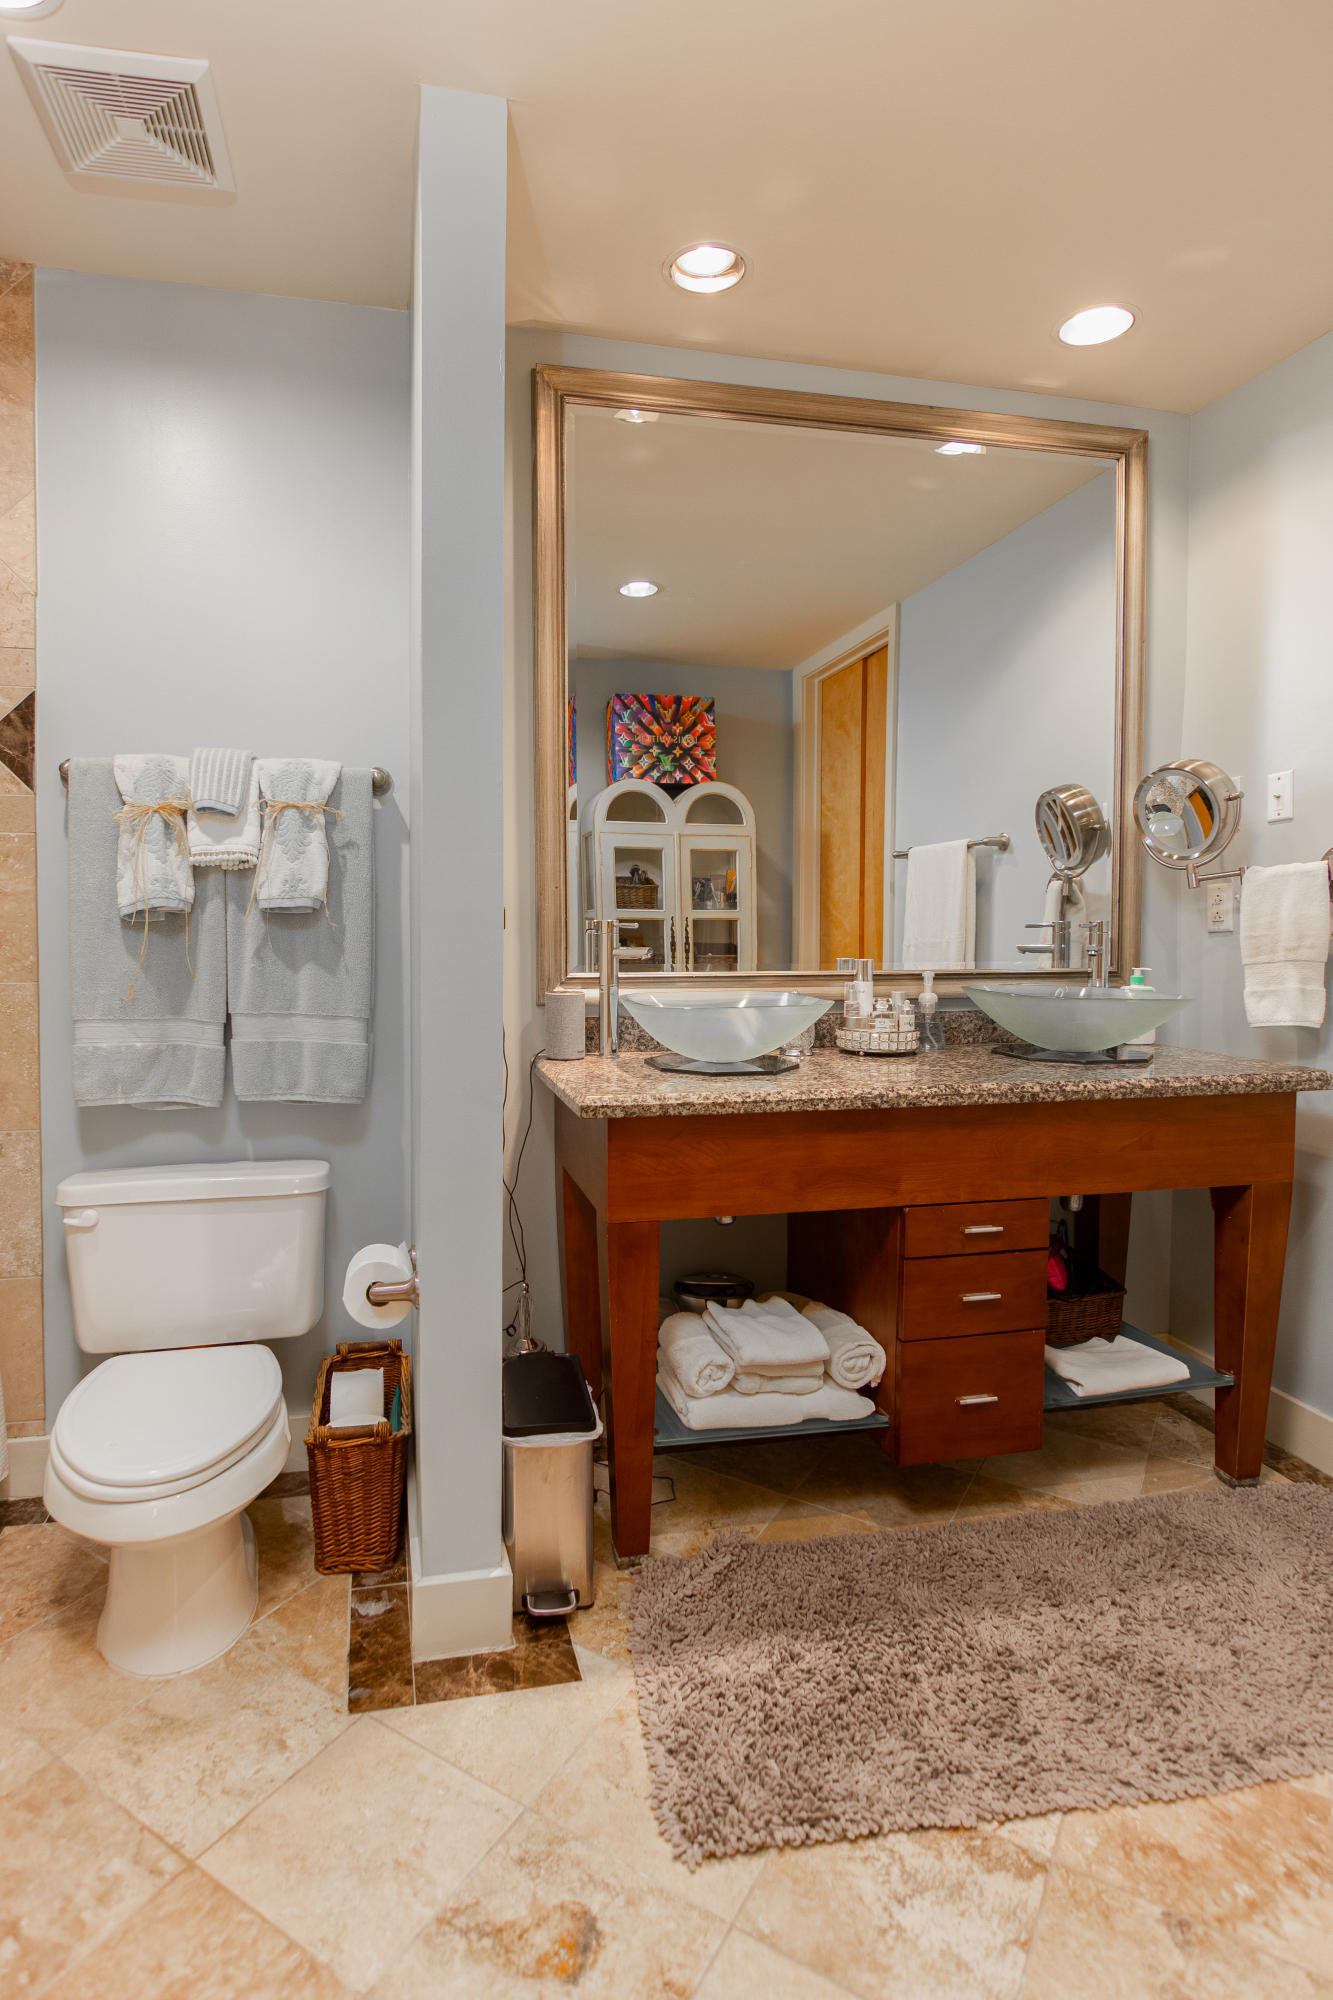 Bee Street Lofts Homes For Sale - 150 Bee, Charleston, SC - 5